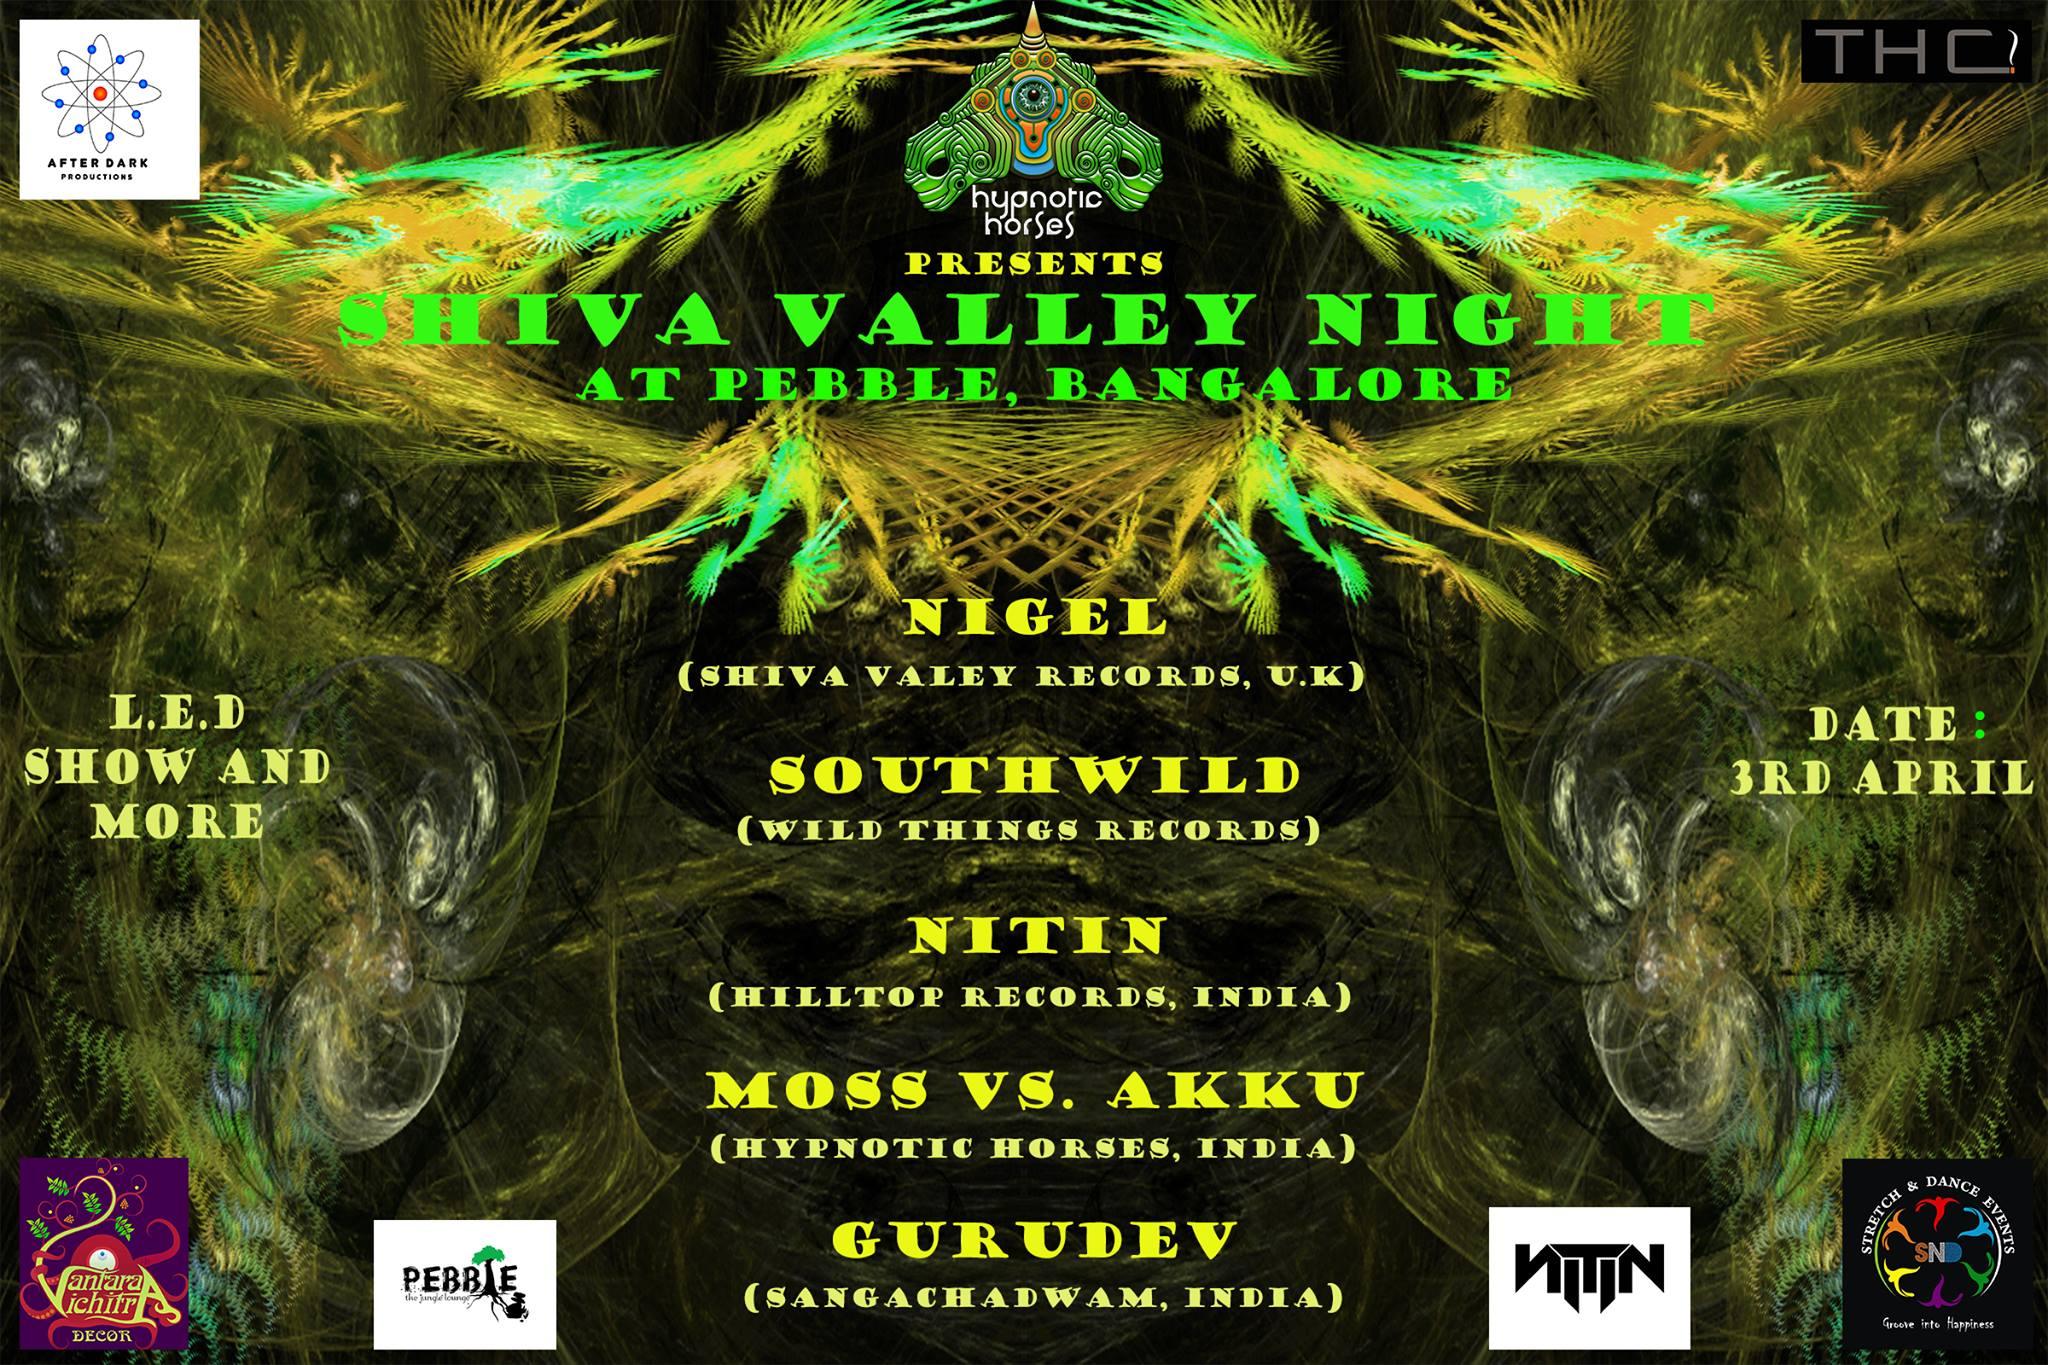 Shiva_valley_night_-_pebble